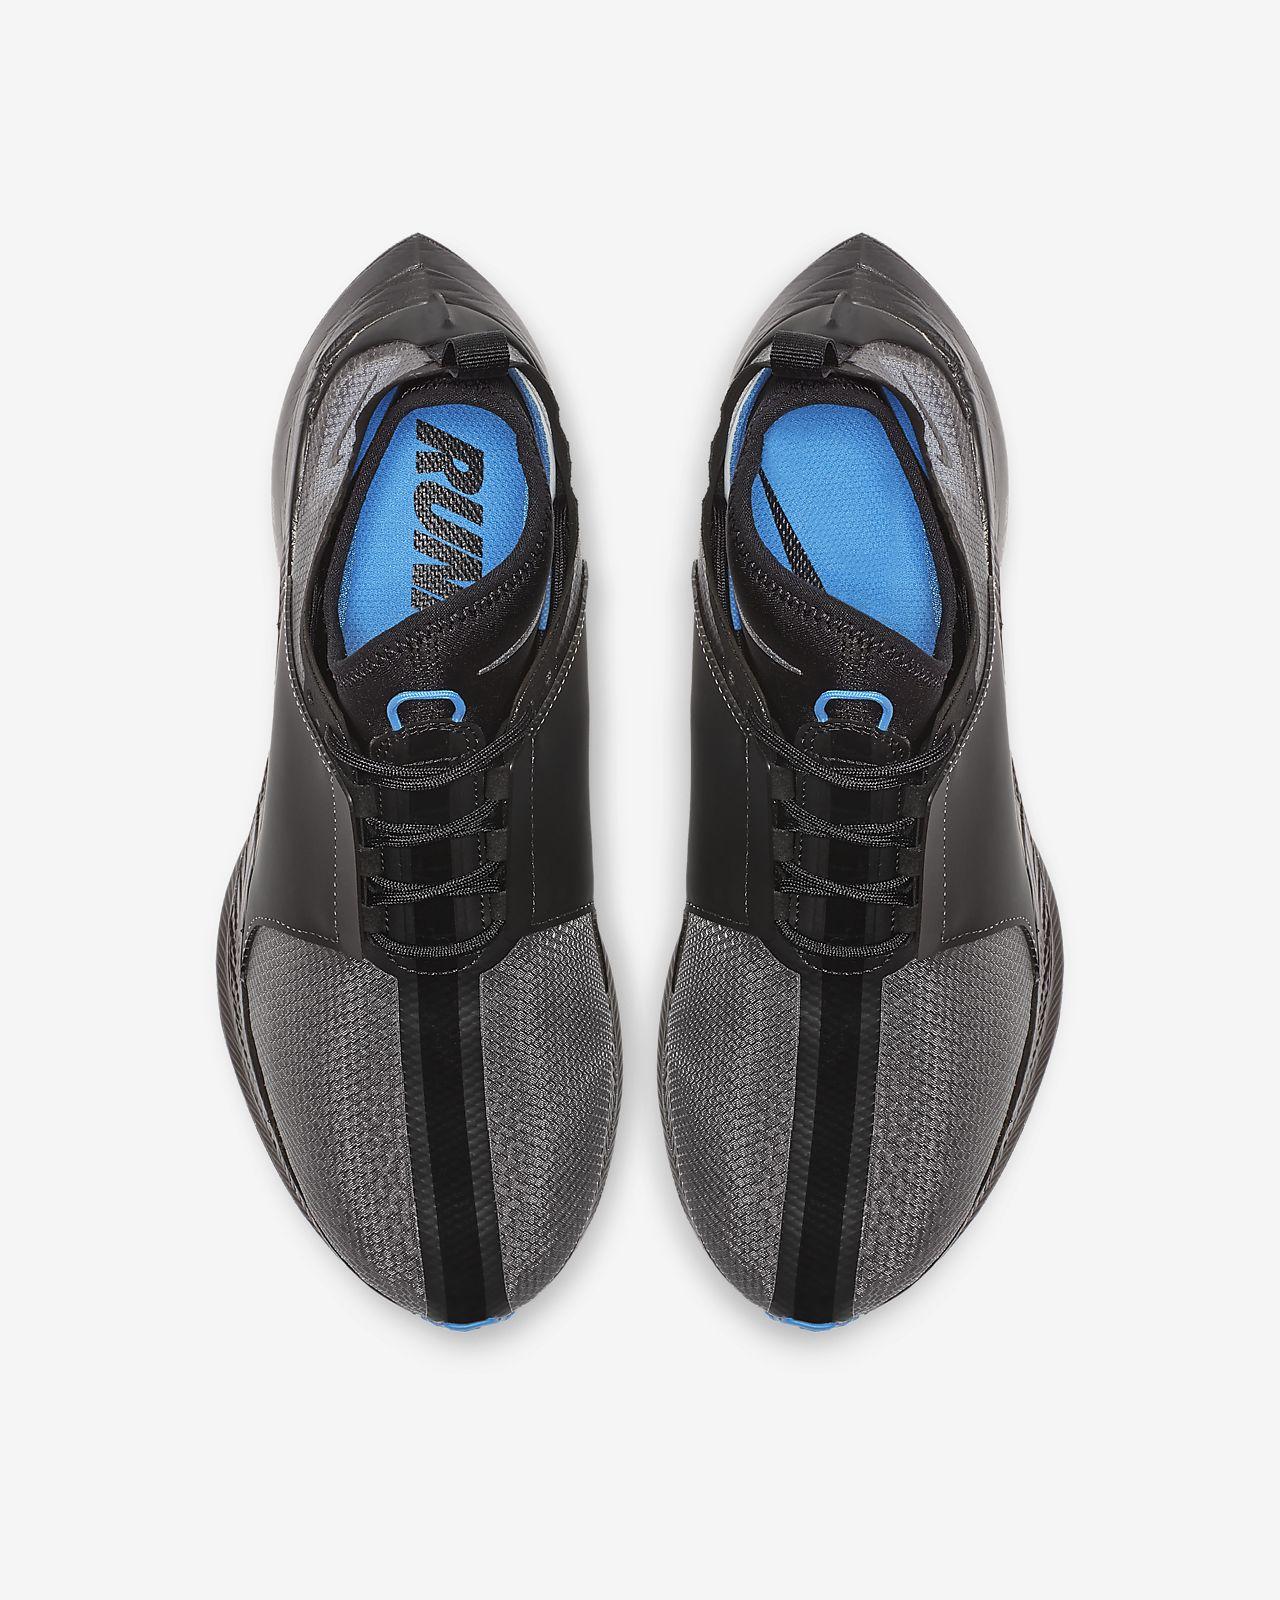 wholesale dealer fd0f2 cfe69 Nike Zoom Pegasus Turbo XX Hardloopschoen voor dames. Nike.com BE